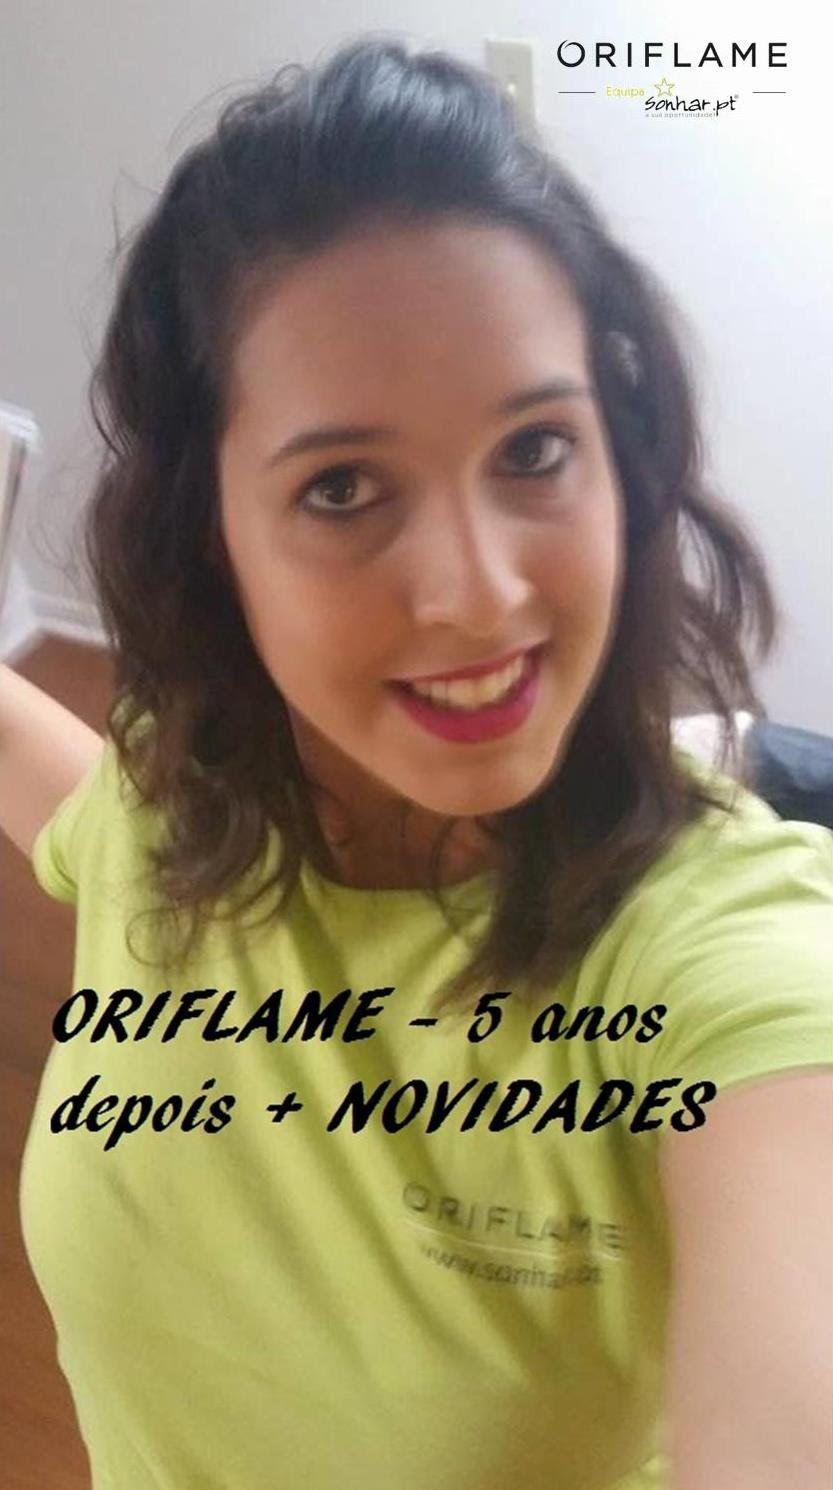 Oriflame - 5 anos depois + NOVIDADES | 25 Novembro 2014